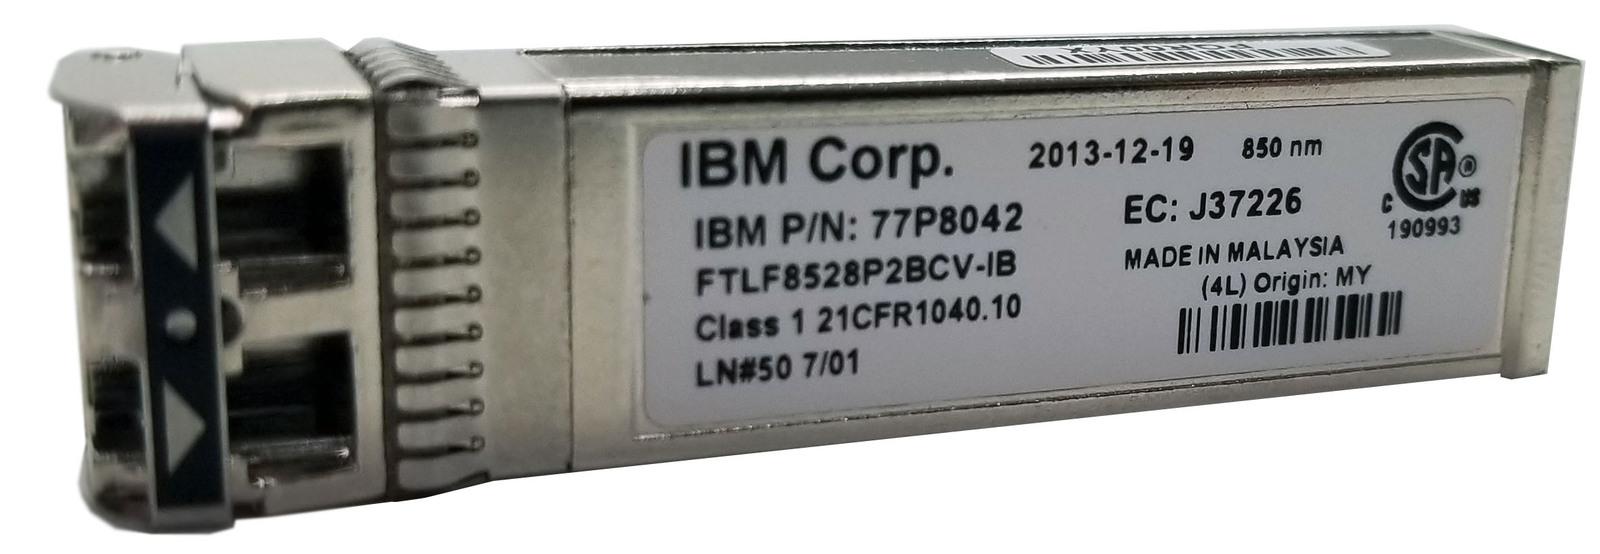 IBM 77P8042 8Gb 850nm Shortwave SFP Transceiver FTLF8528P2BCV-IB HSS Bin:8